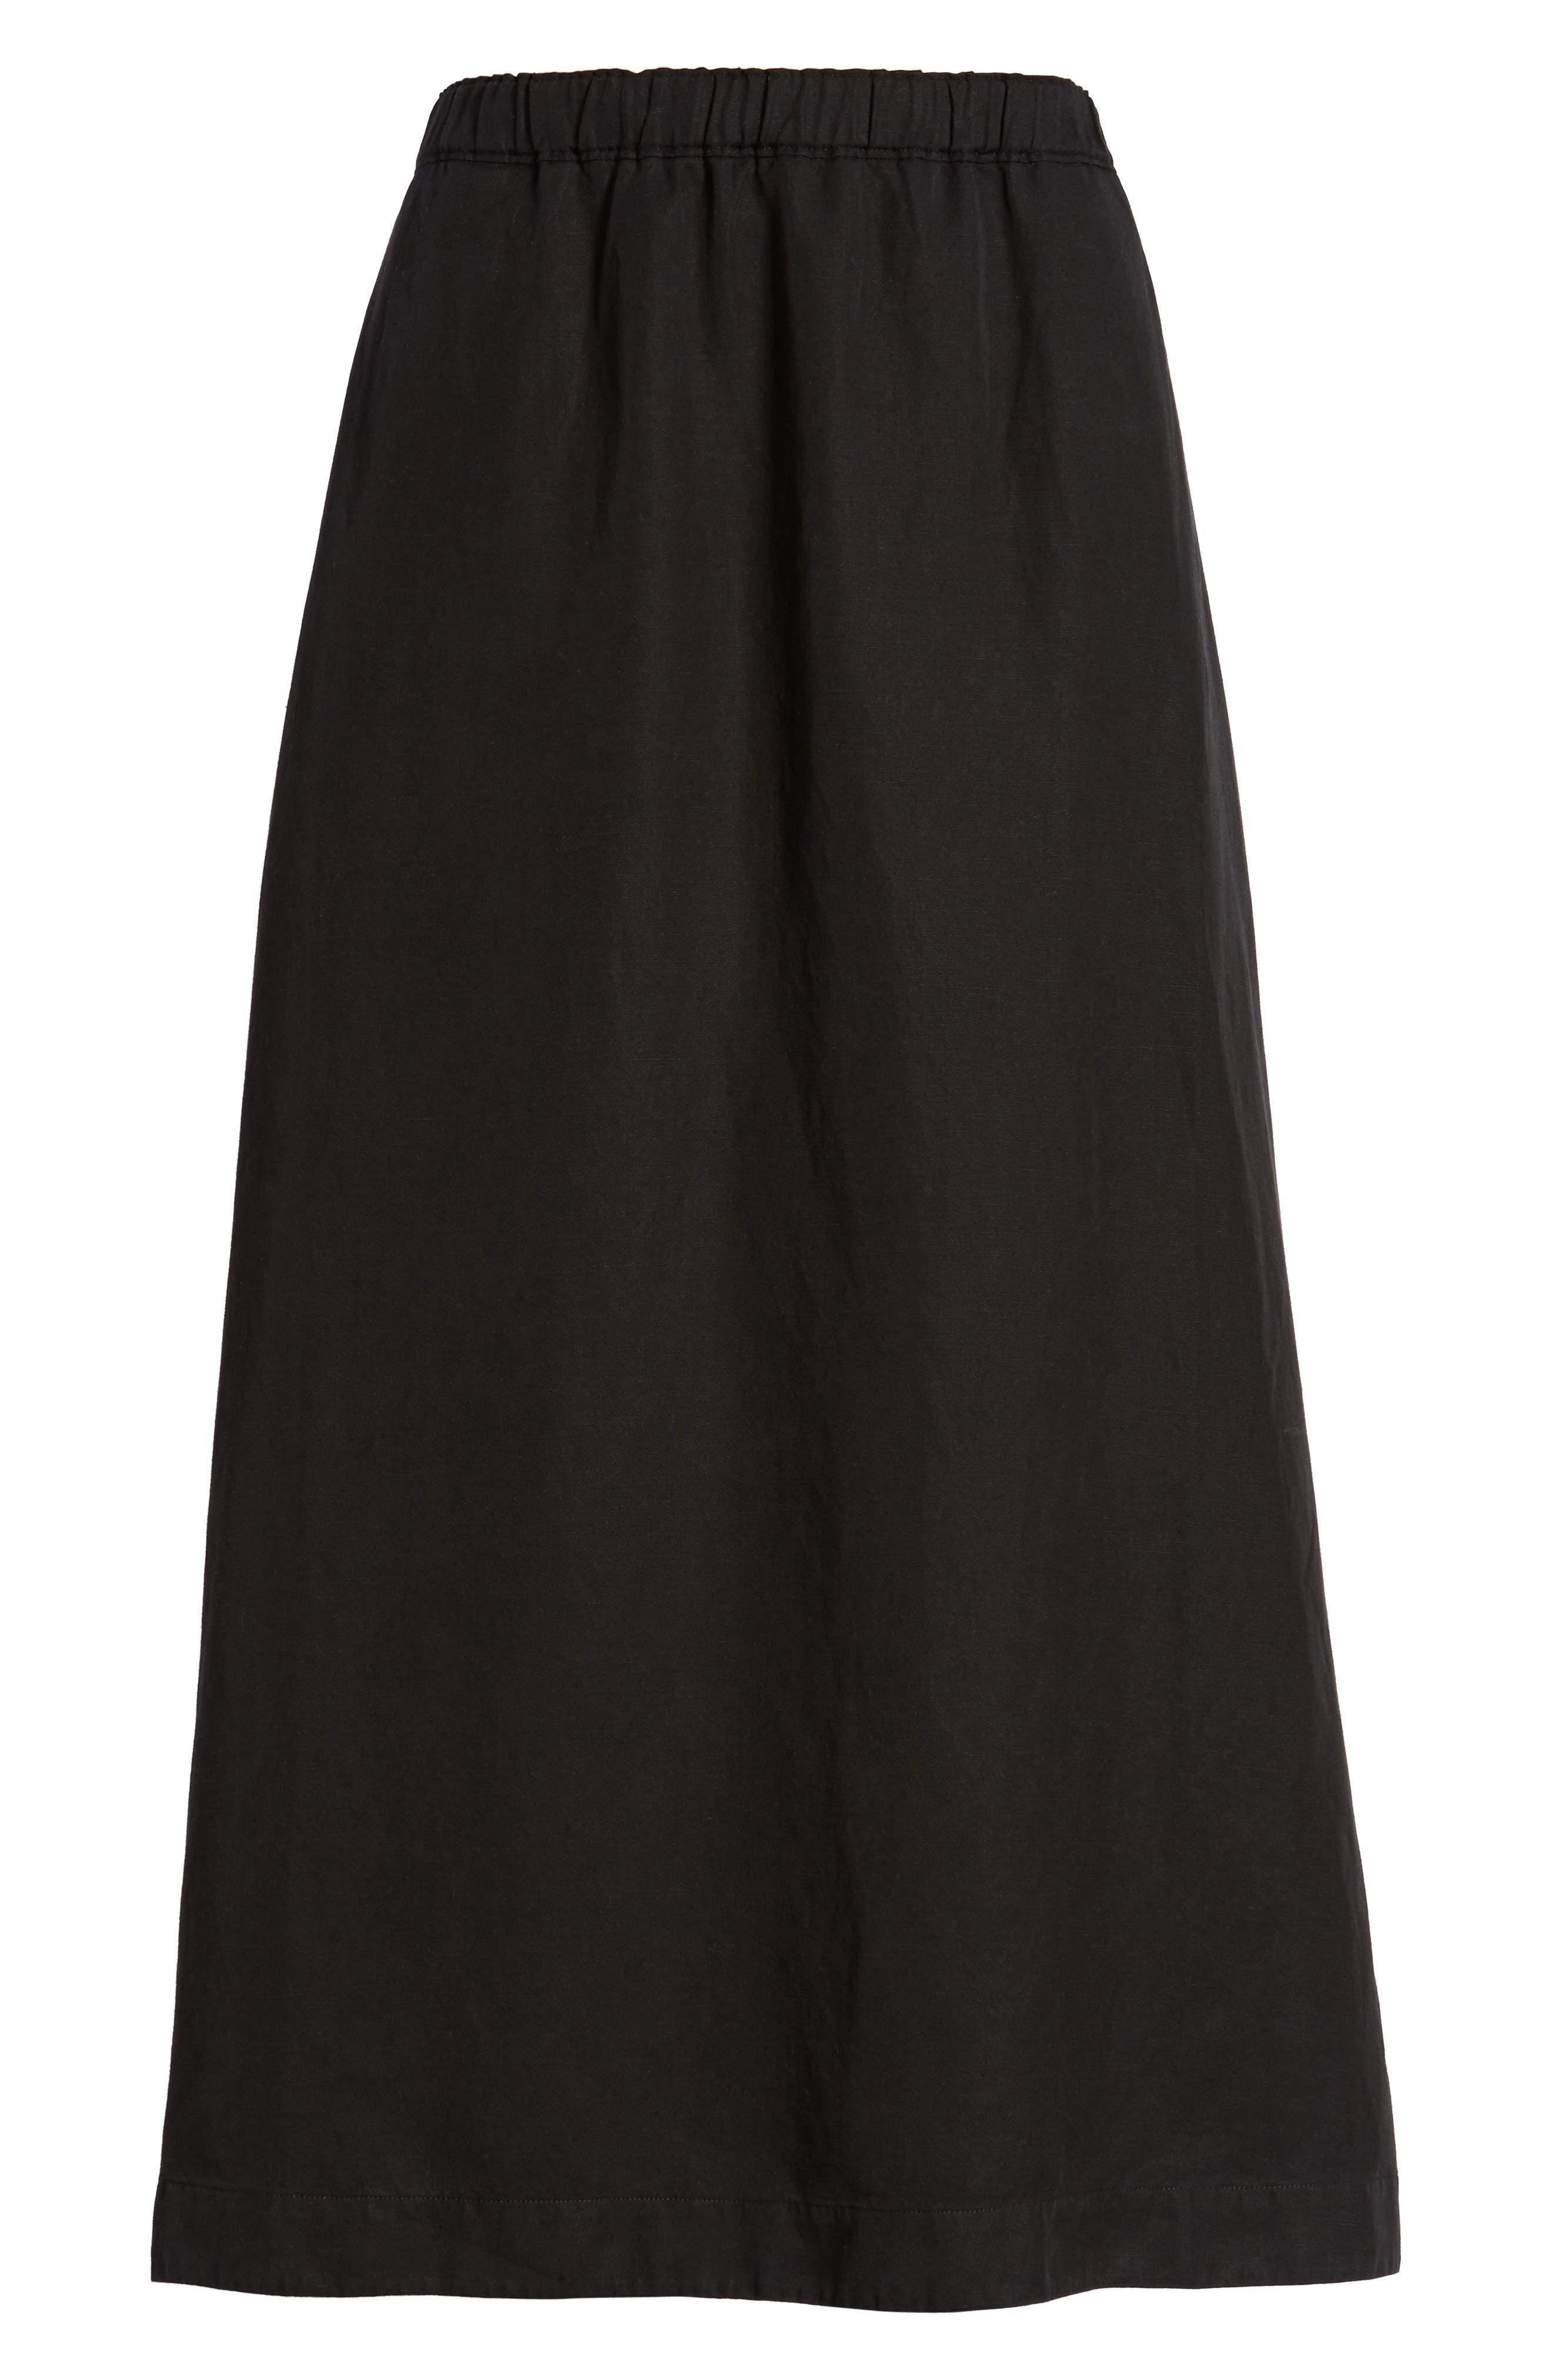 Tencel<sup>®</sup> Lyocell & Linen Midi Skirt,                             Alternate thumbnail 6, color,                             Black